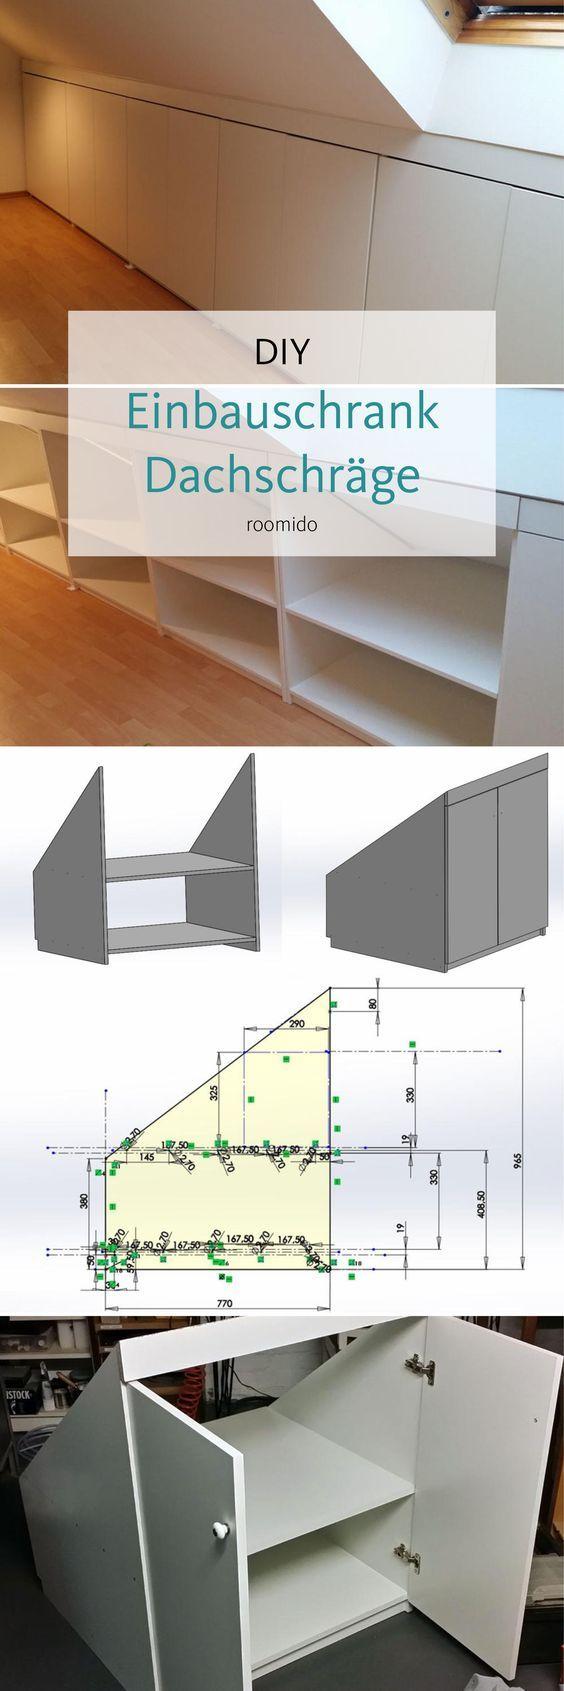 DIY-Einbauschrank: Stauraumwunder im Dachgeschoss | Room, Attic ...